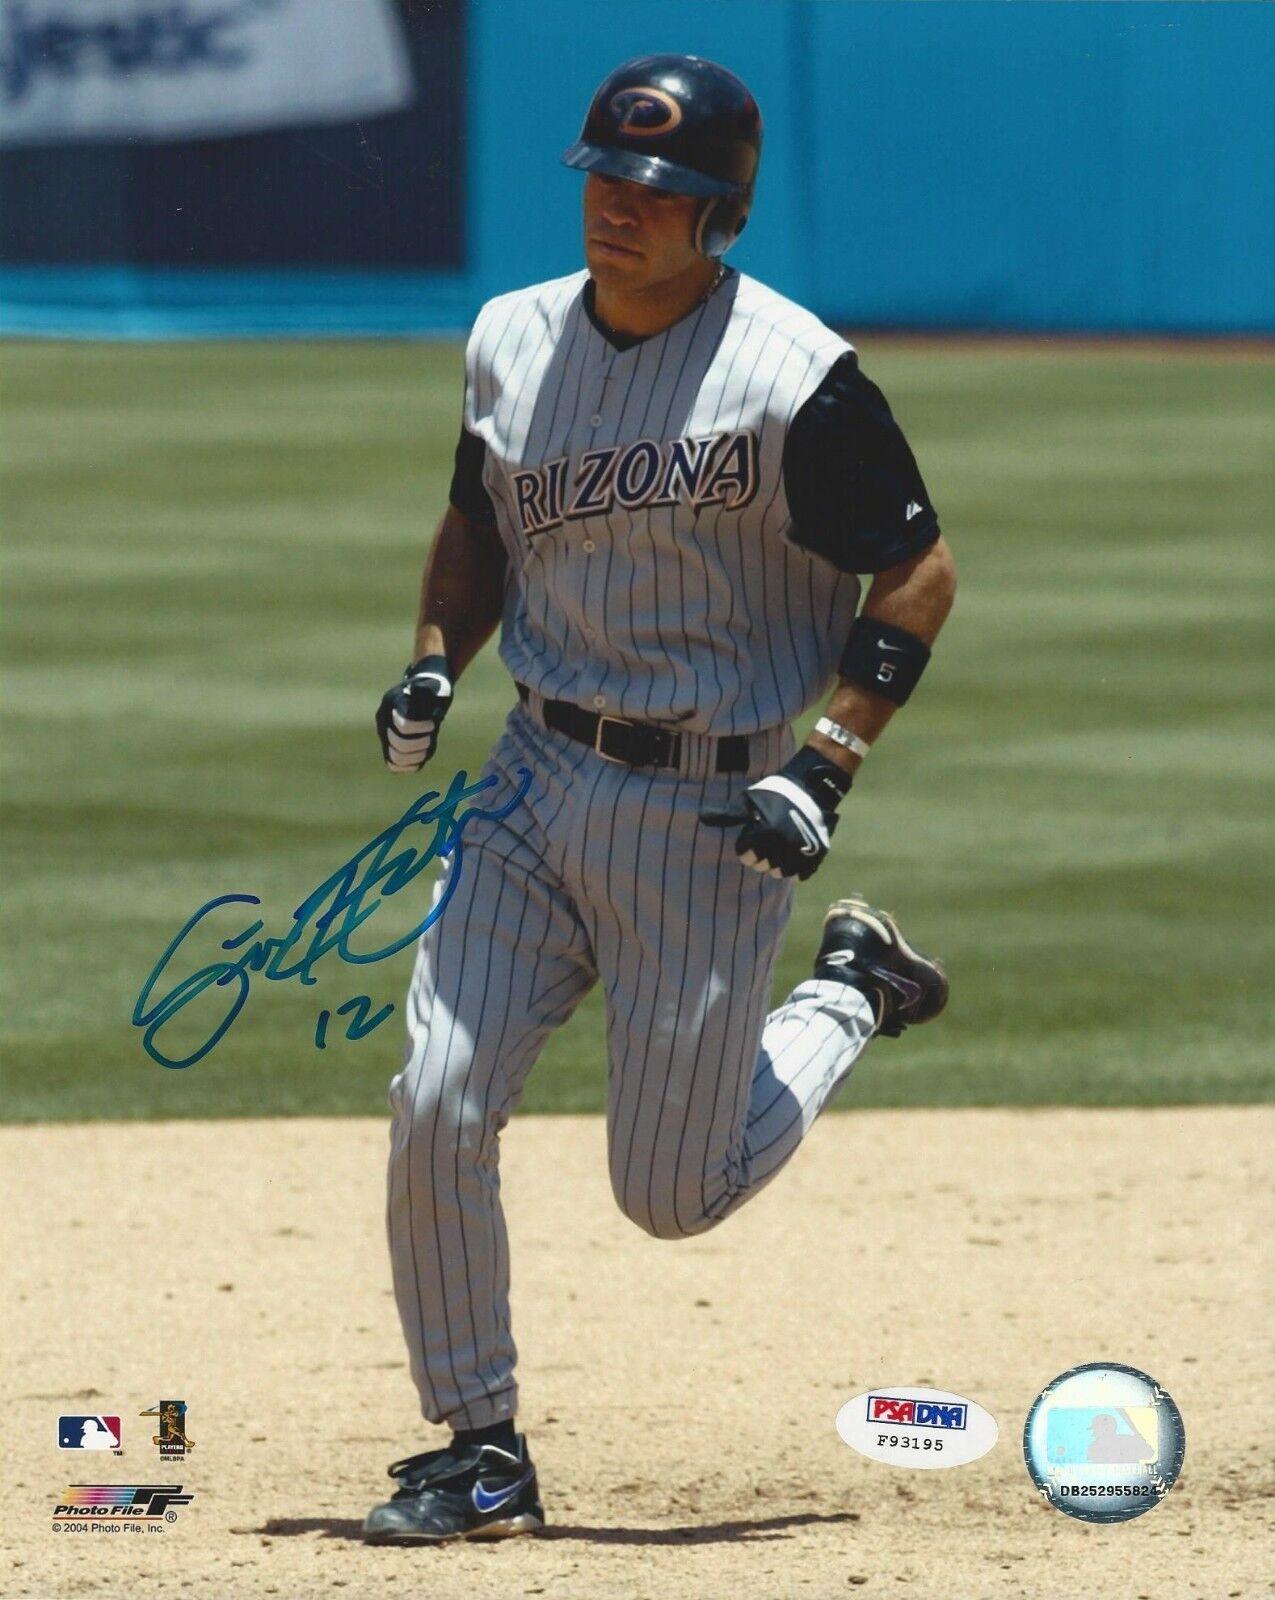 Scott Hairston Arizona Diamondbacks signed 8x10 photo PSA/DNA #F93195